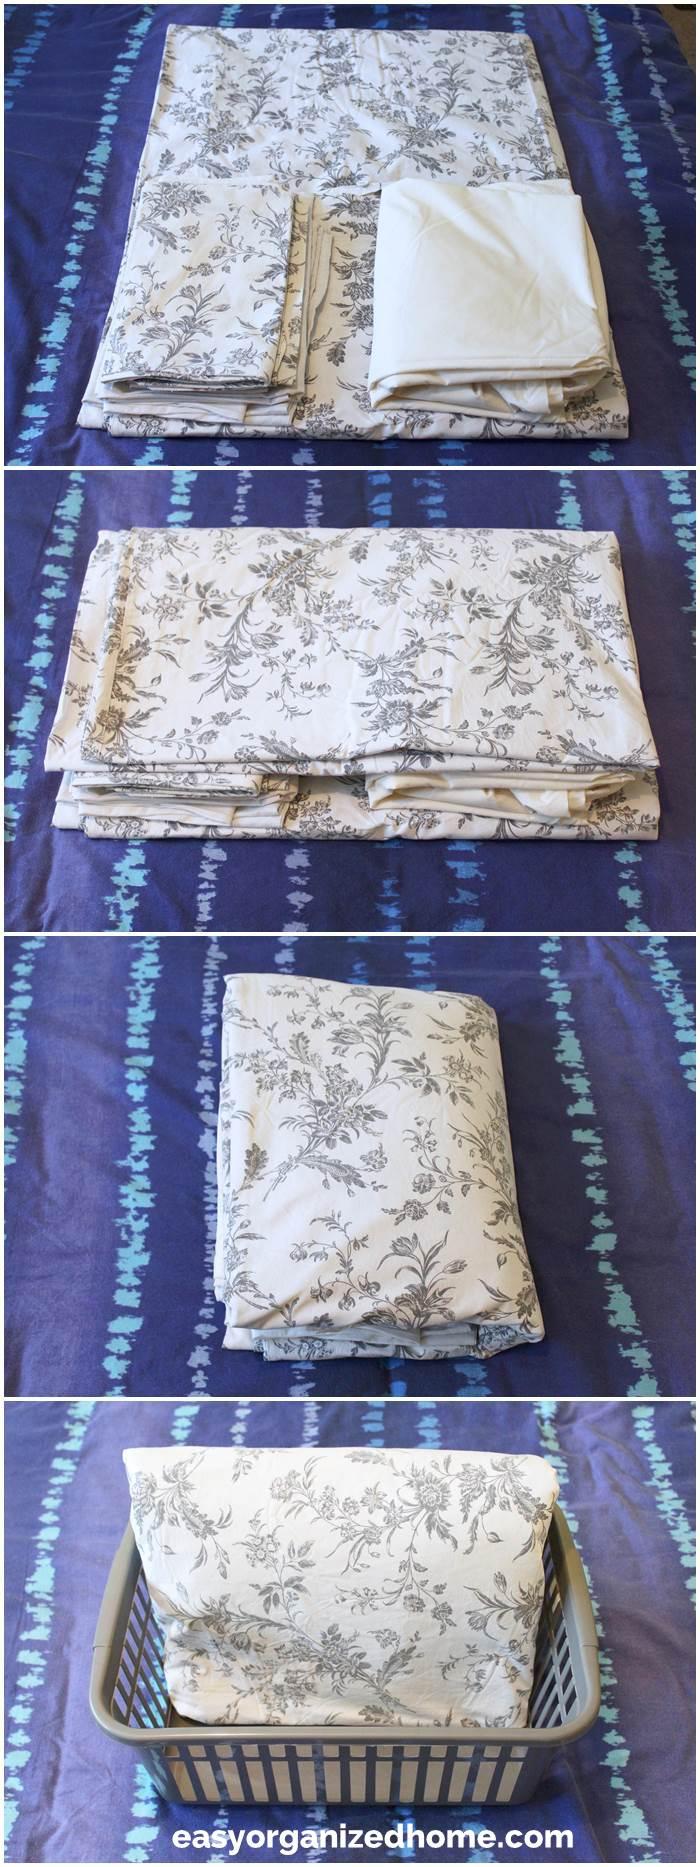 technique and folding ideas for your linen closet organization